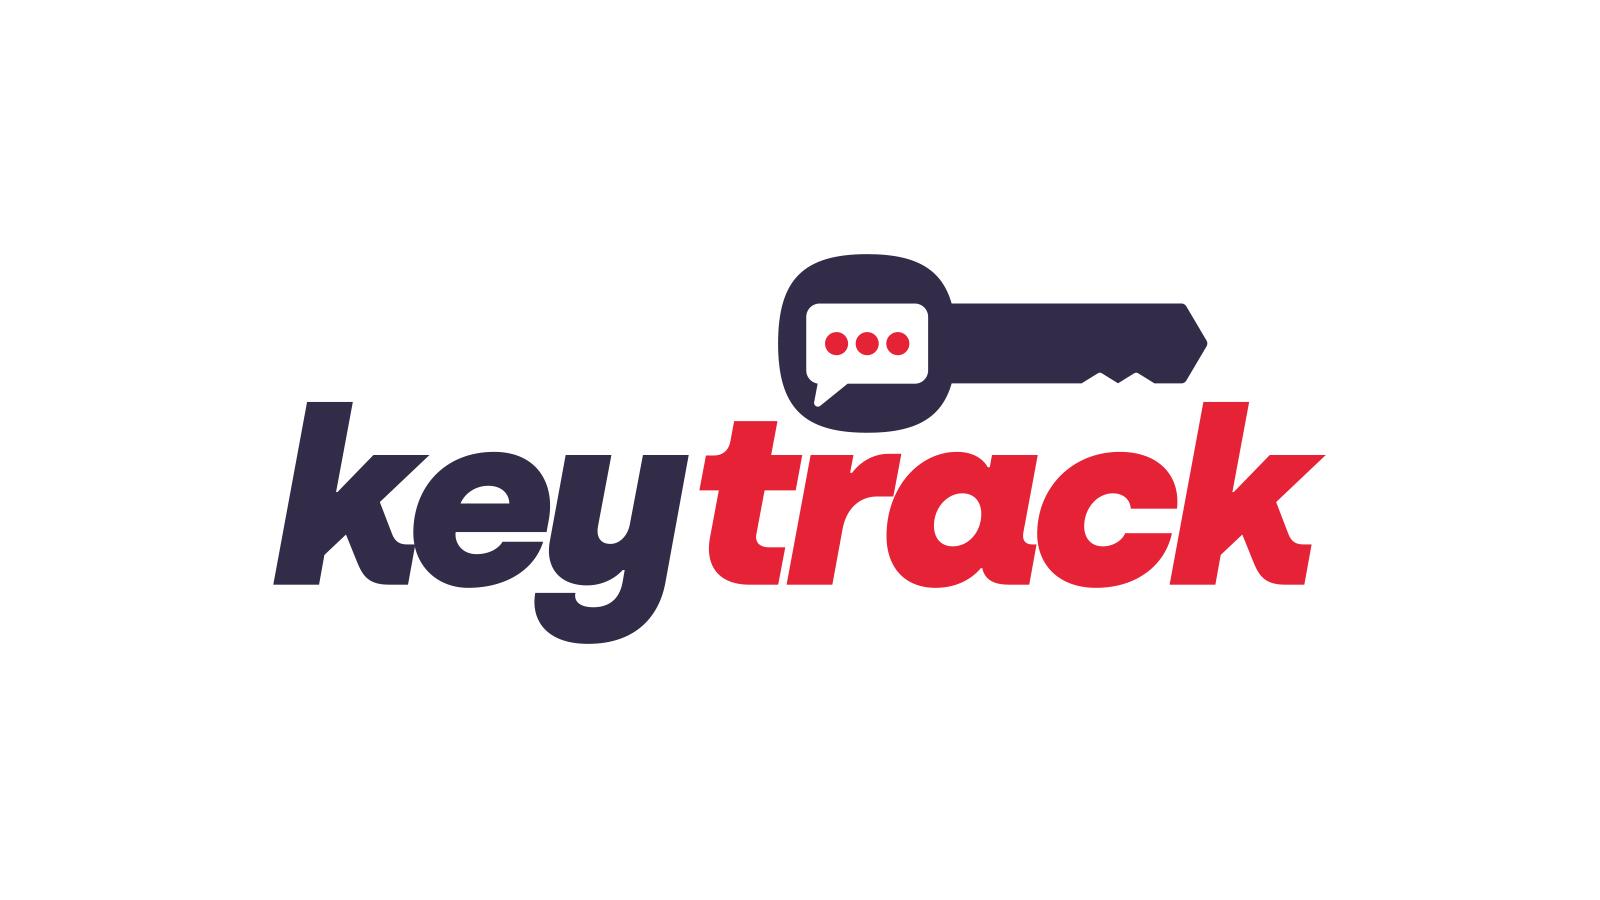 keytrack-logo-redesign-std